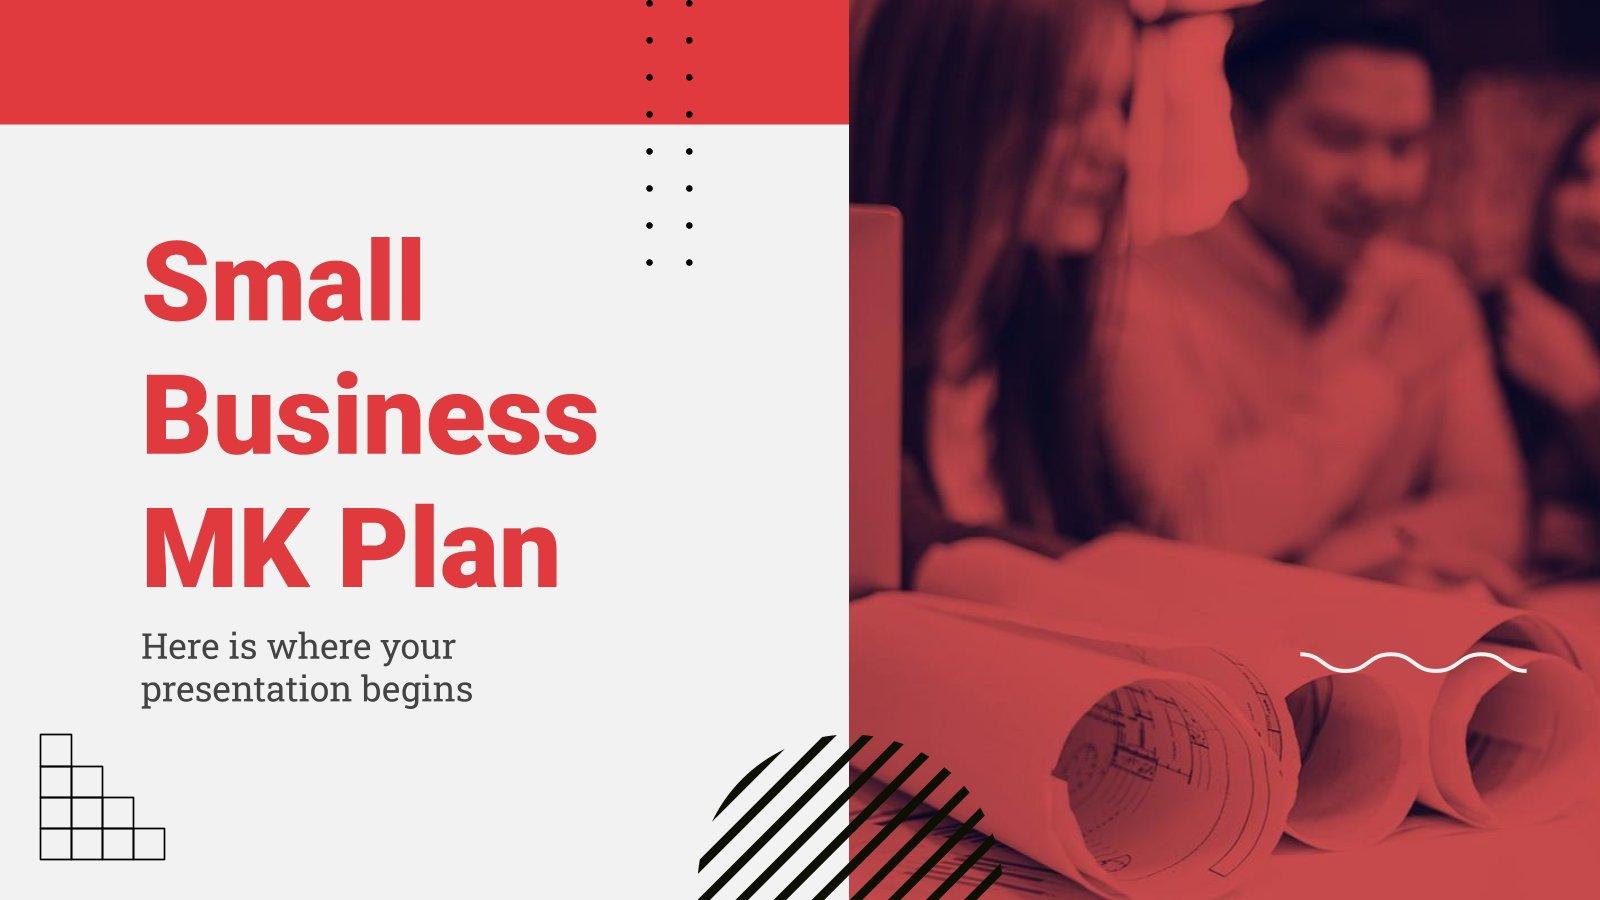 Small Business MK Plan presentation template